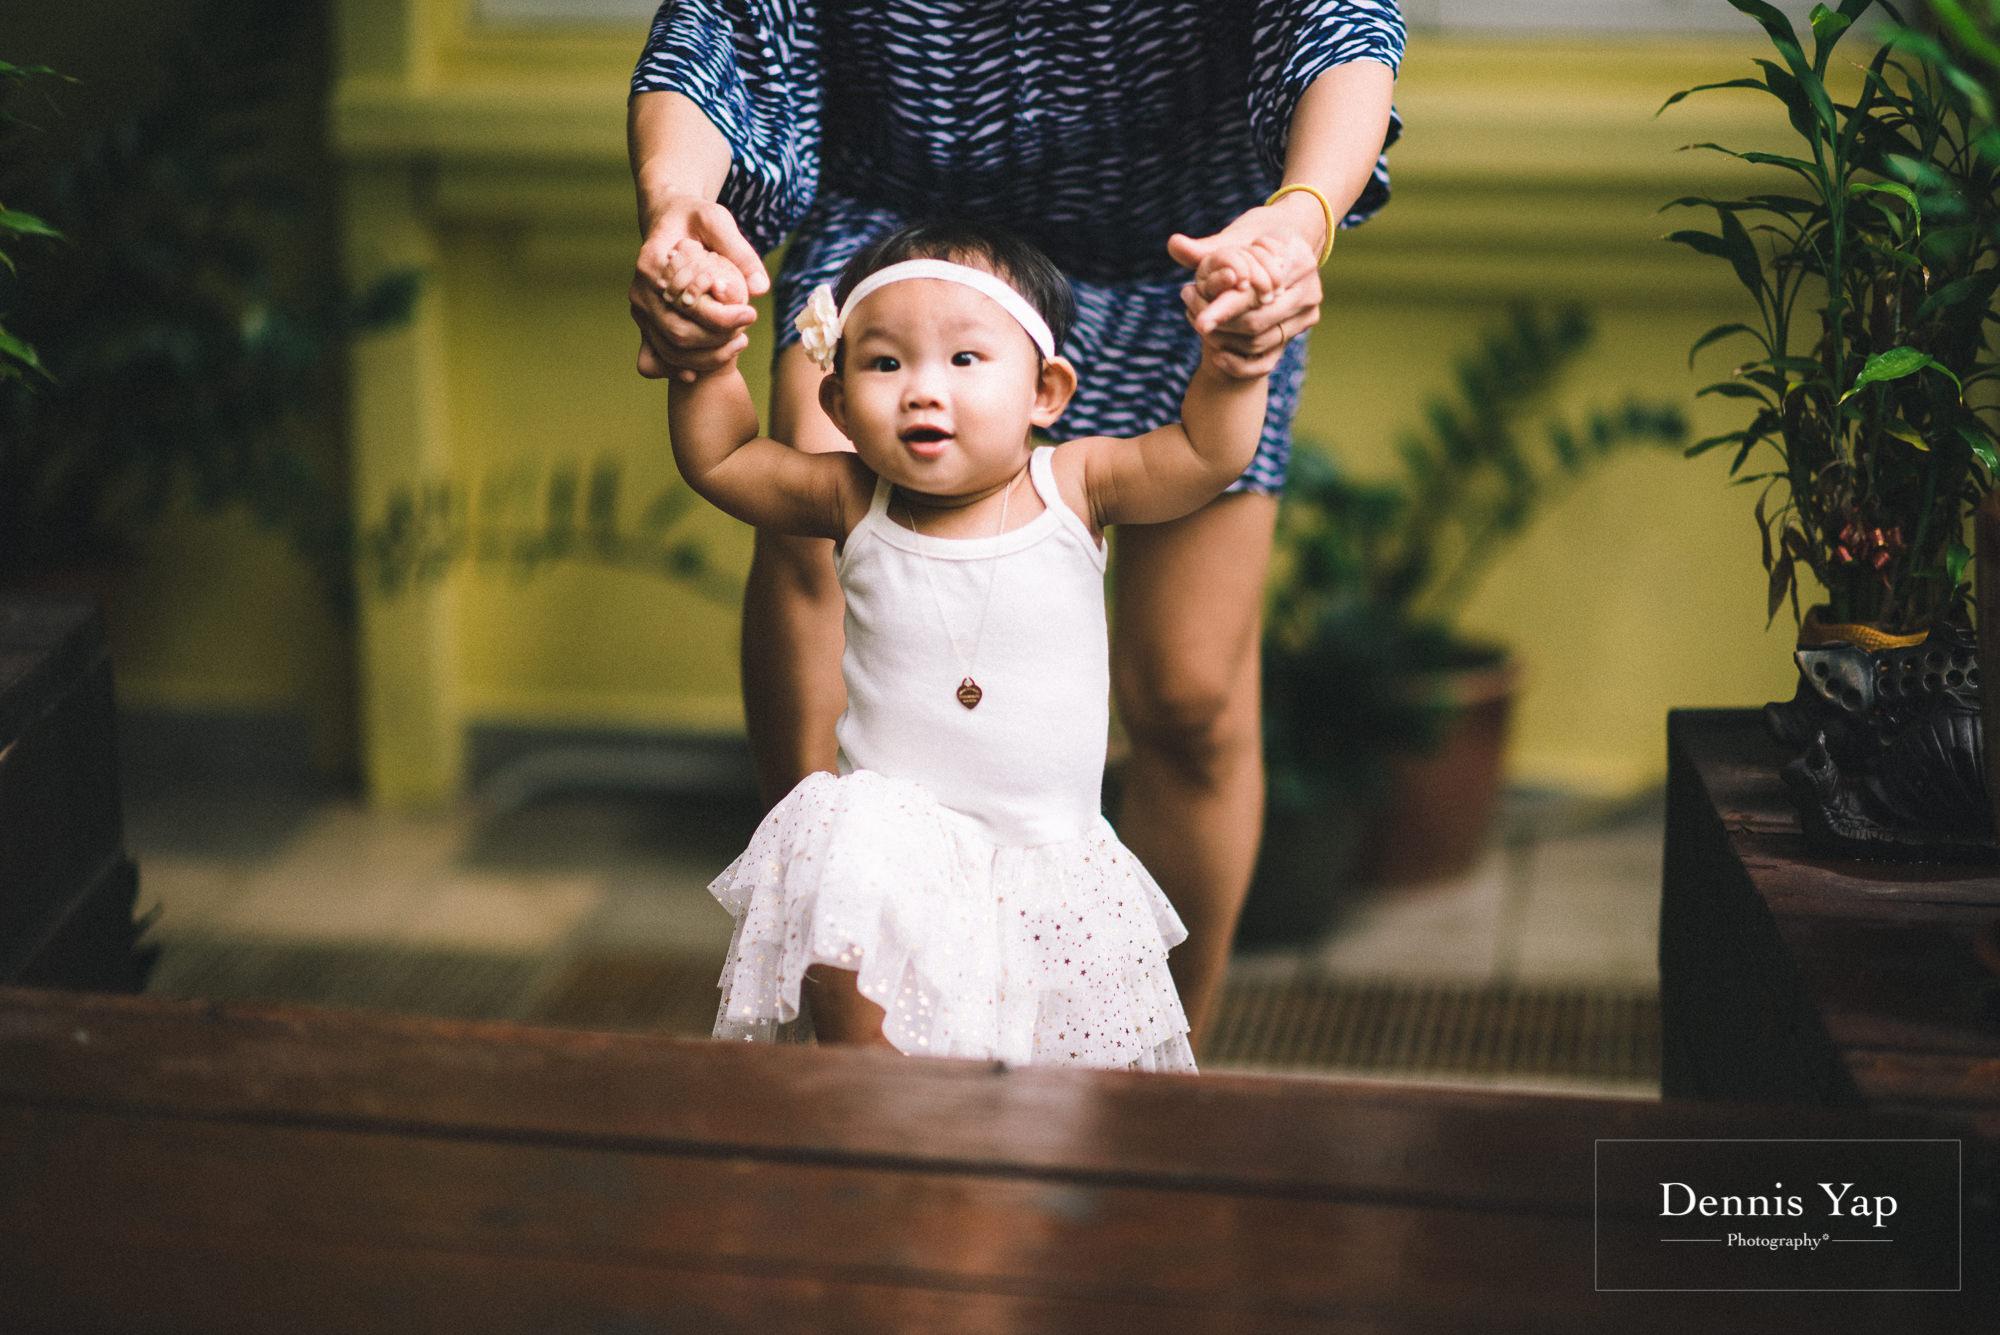 thong family chuen thong portrait beloved dennis yap photography-2.jpg